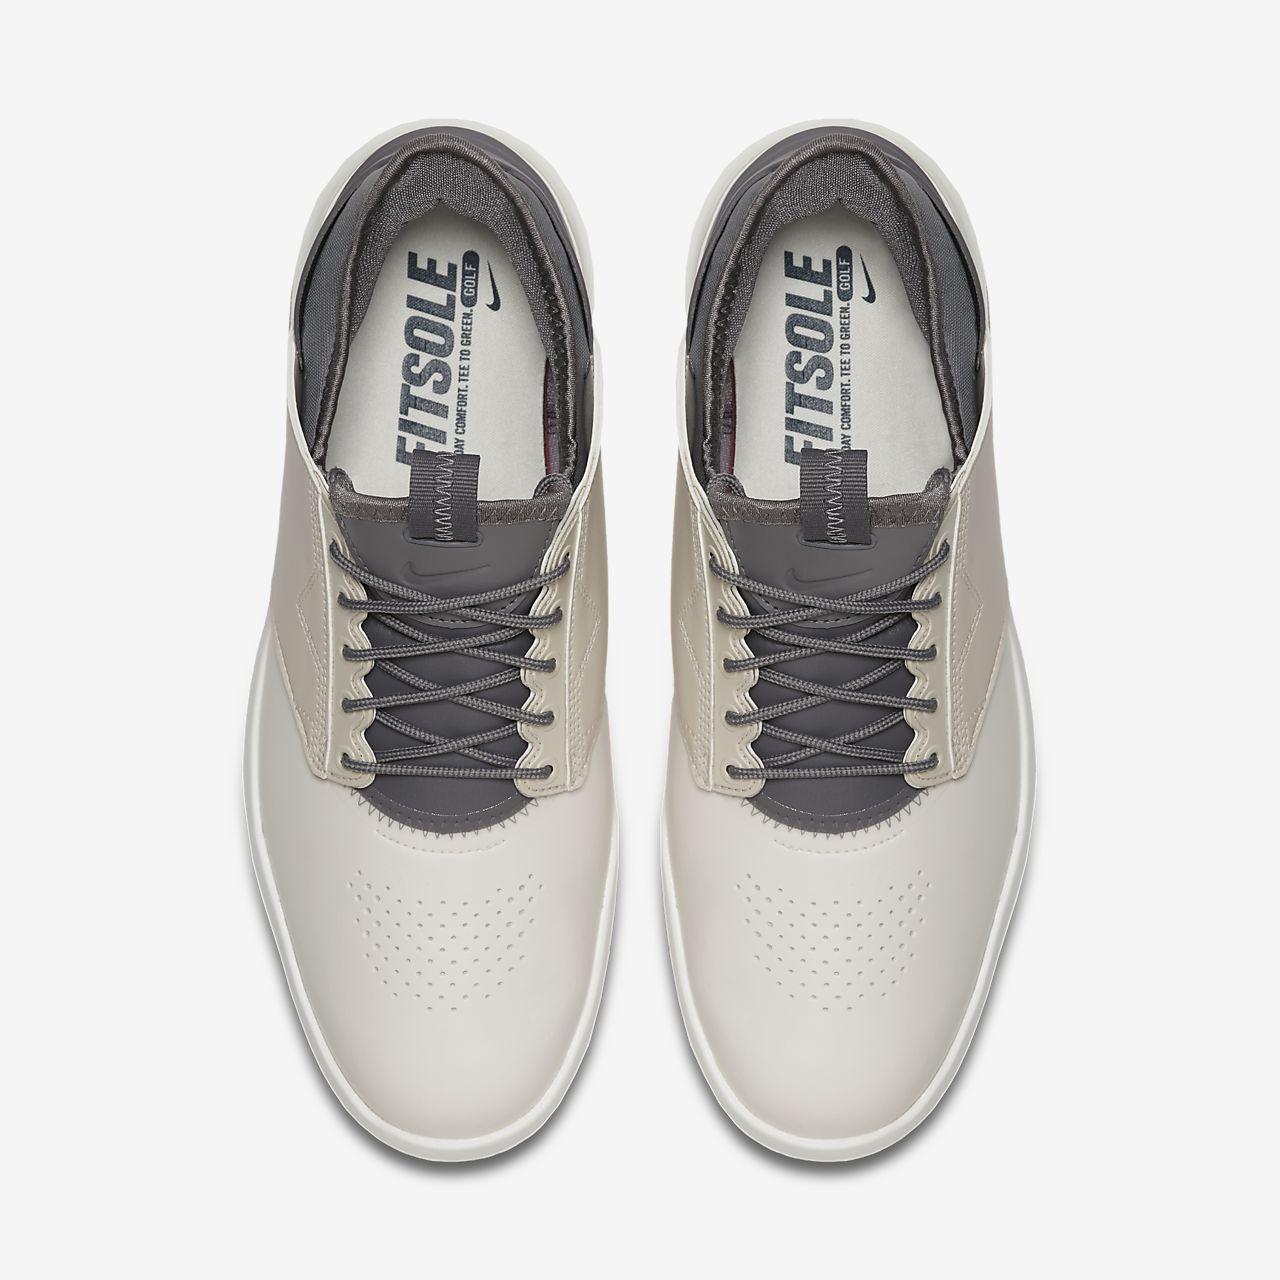 362acca451dfa Nike Air Zoom Direct Men s Golf Shoe. Nike.com GB